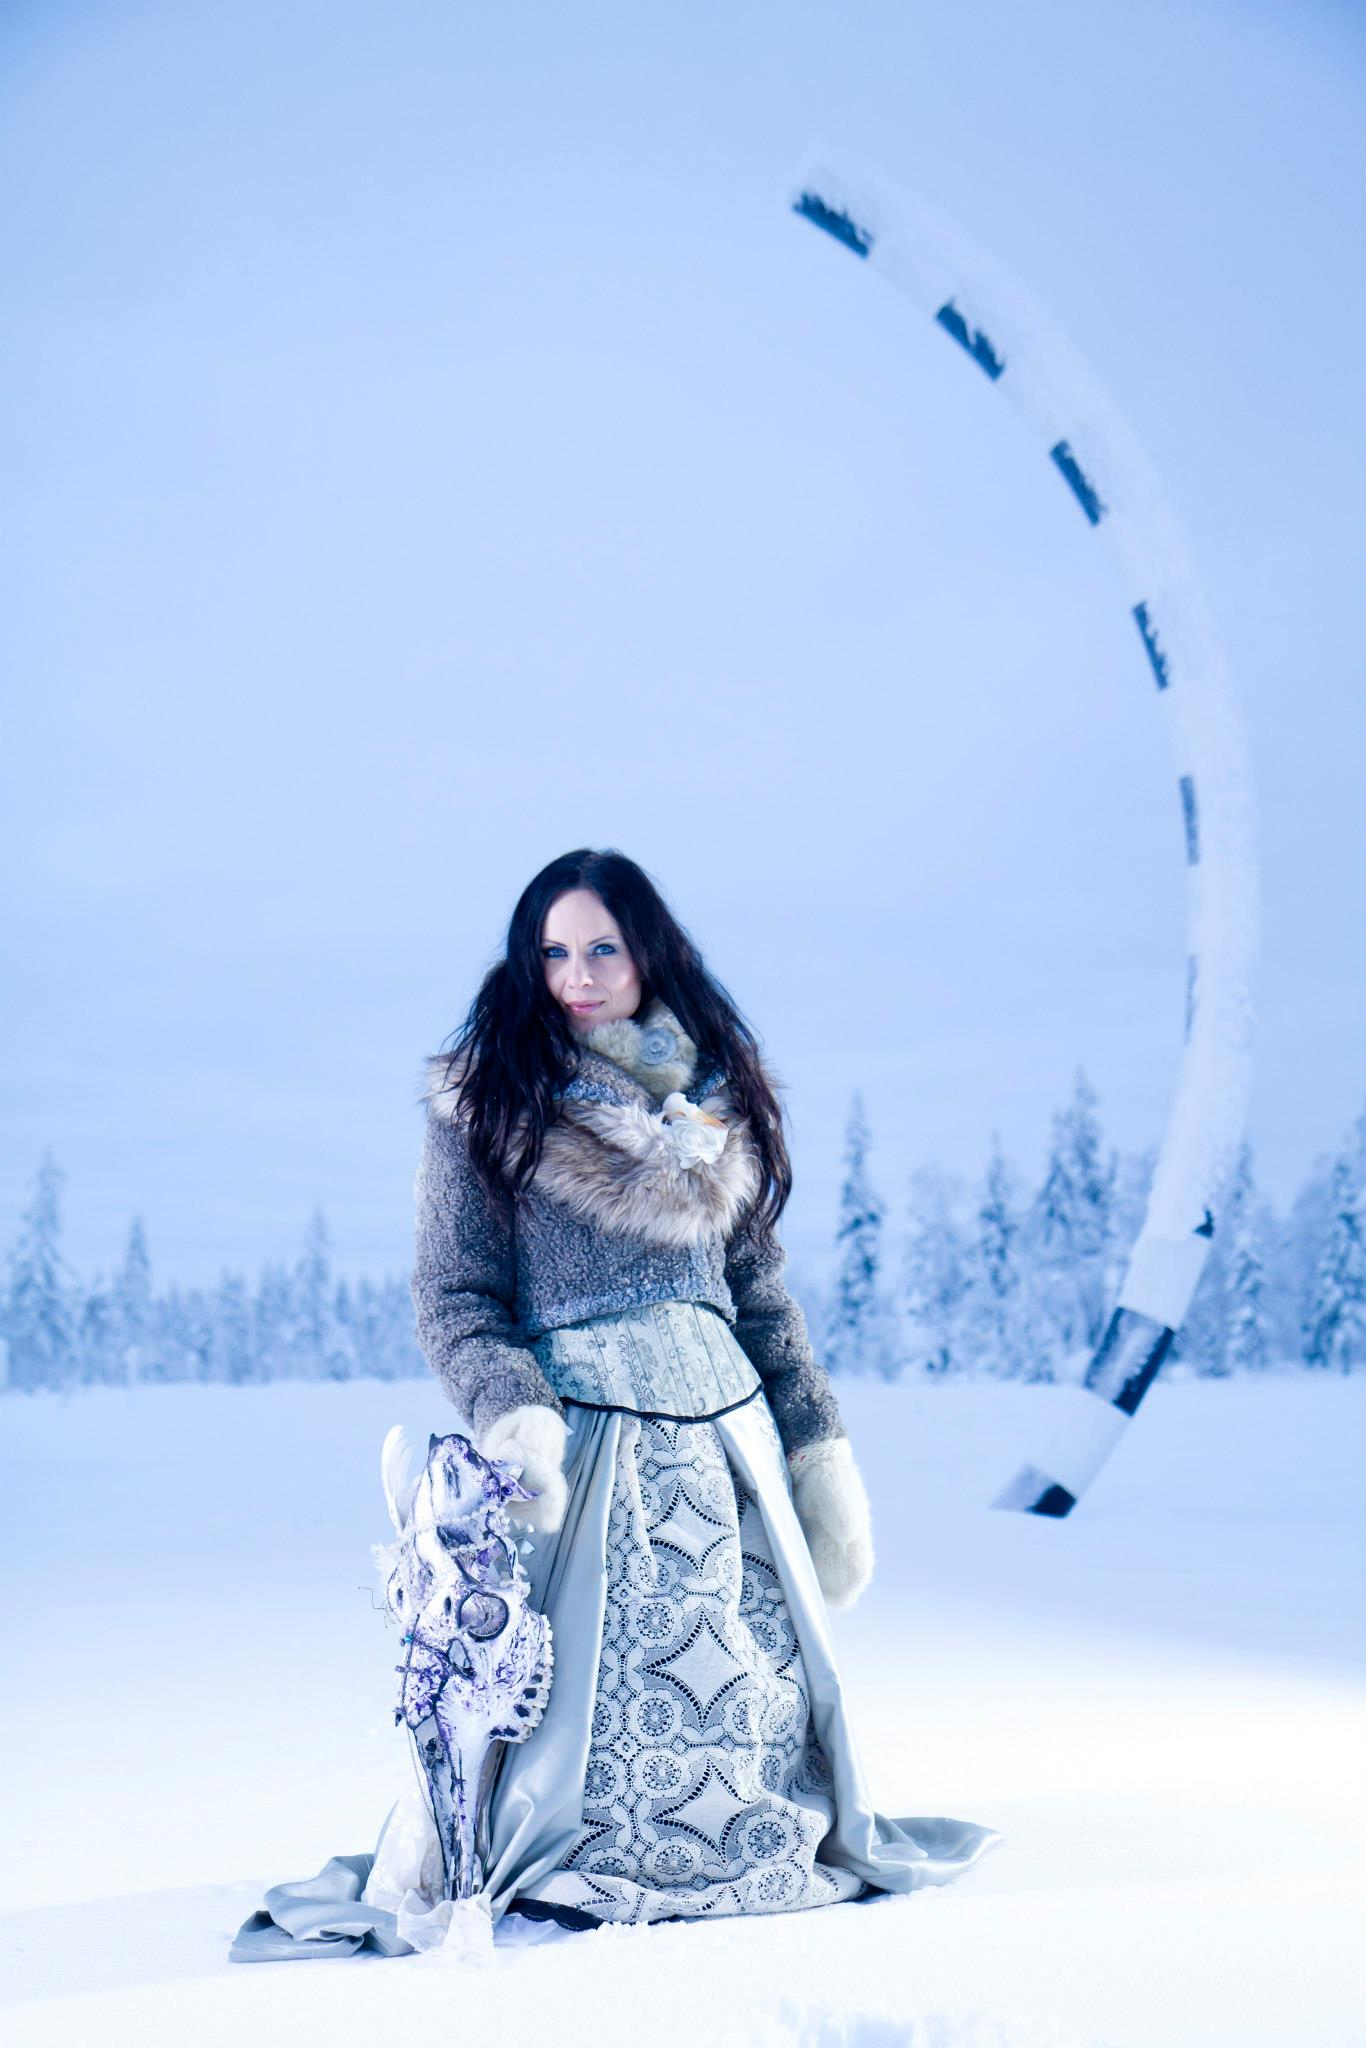 Petra Shara Stoor, Foto: Fredrik Broman Humanspectra.com